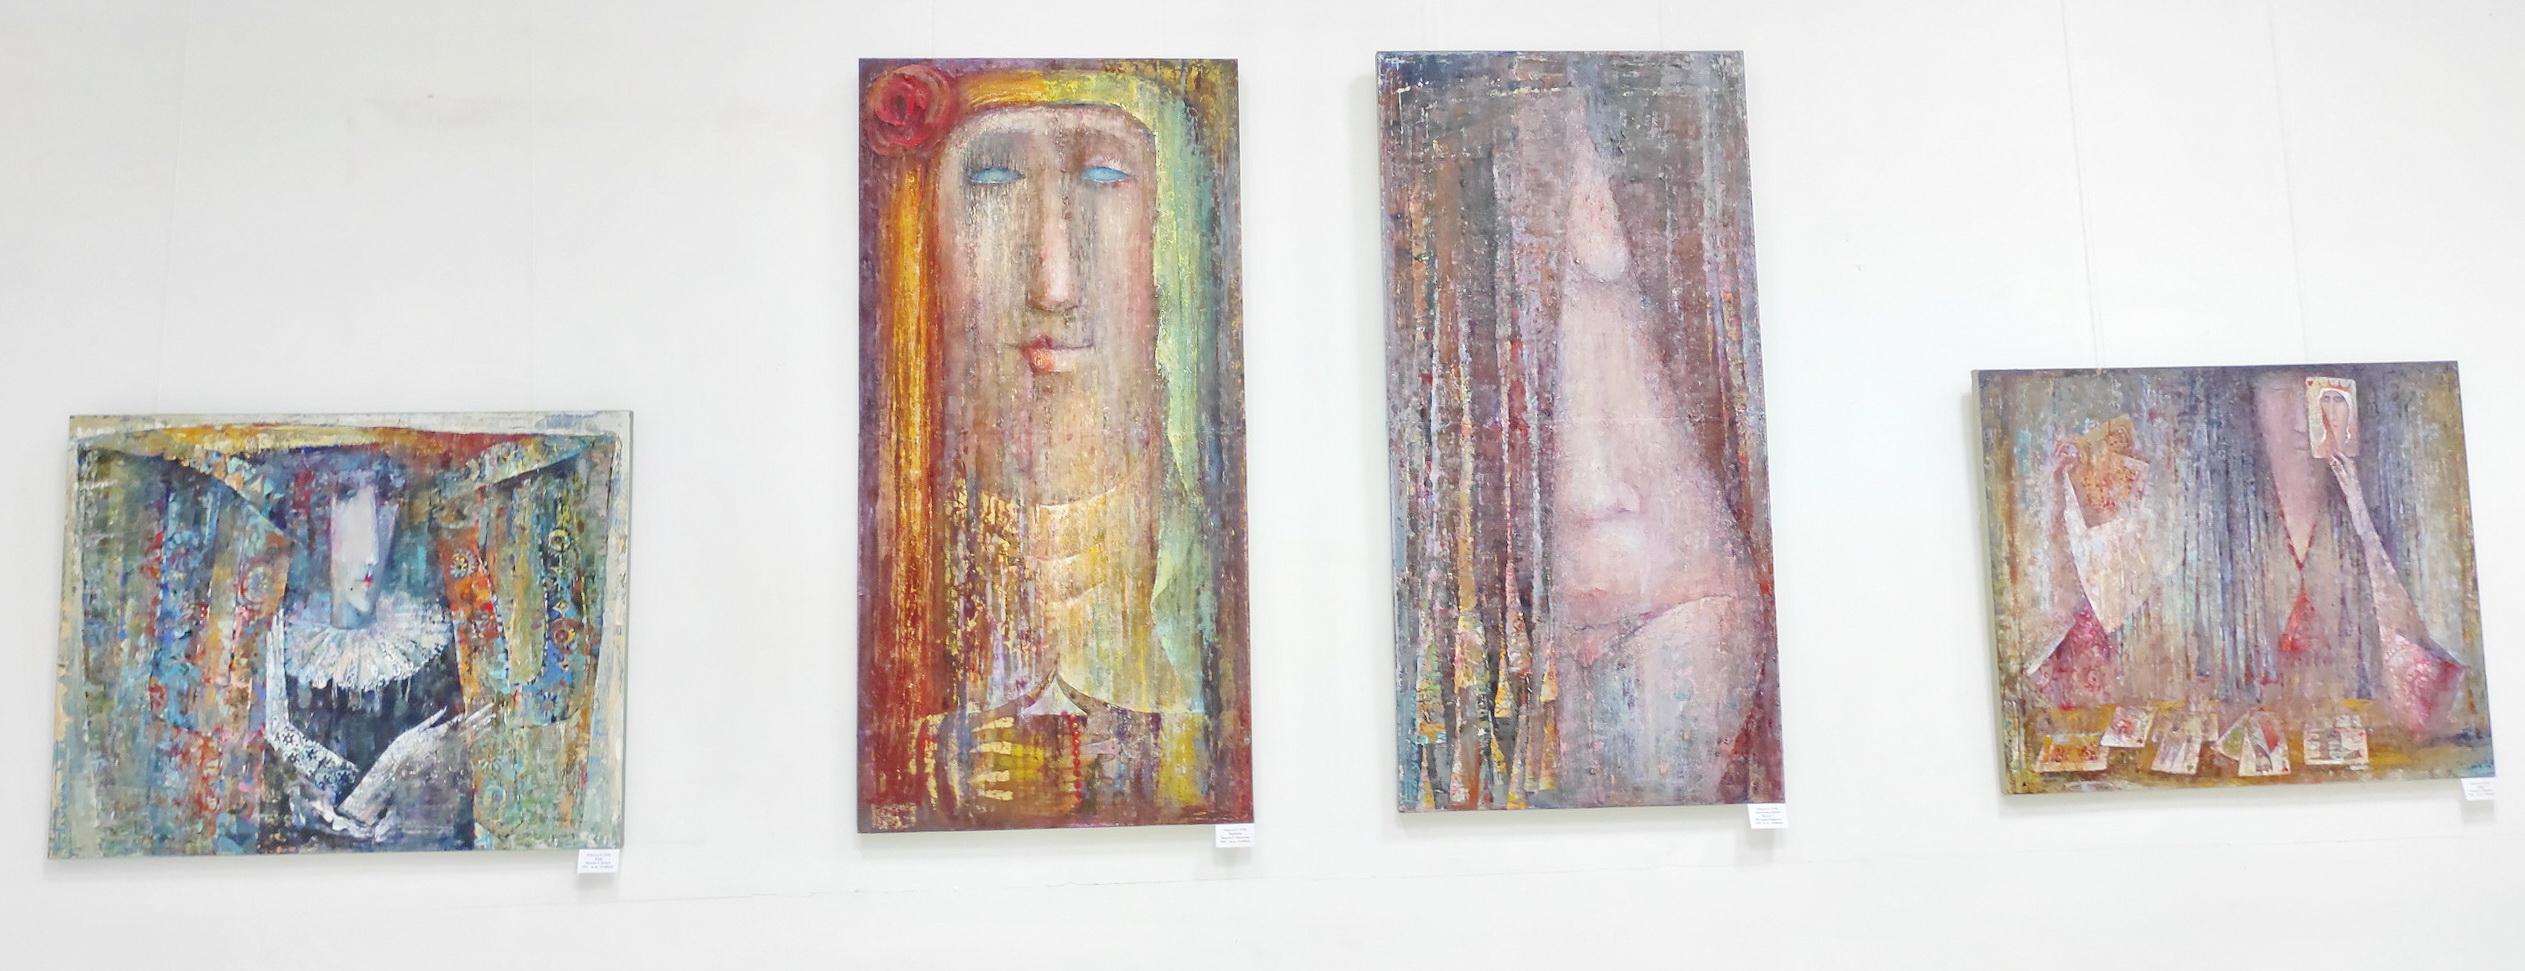 Фадеева Татьяна. Экспозиция картин.